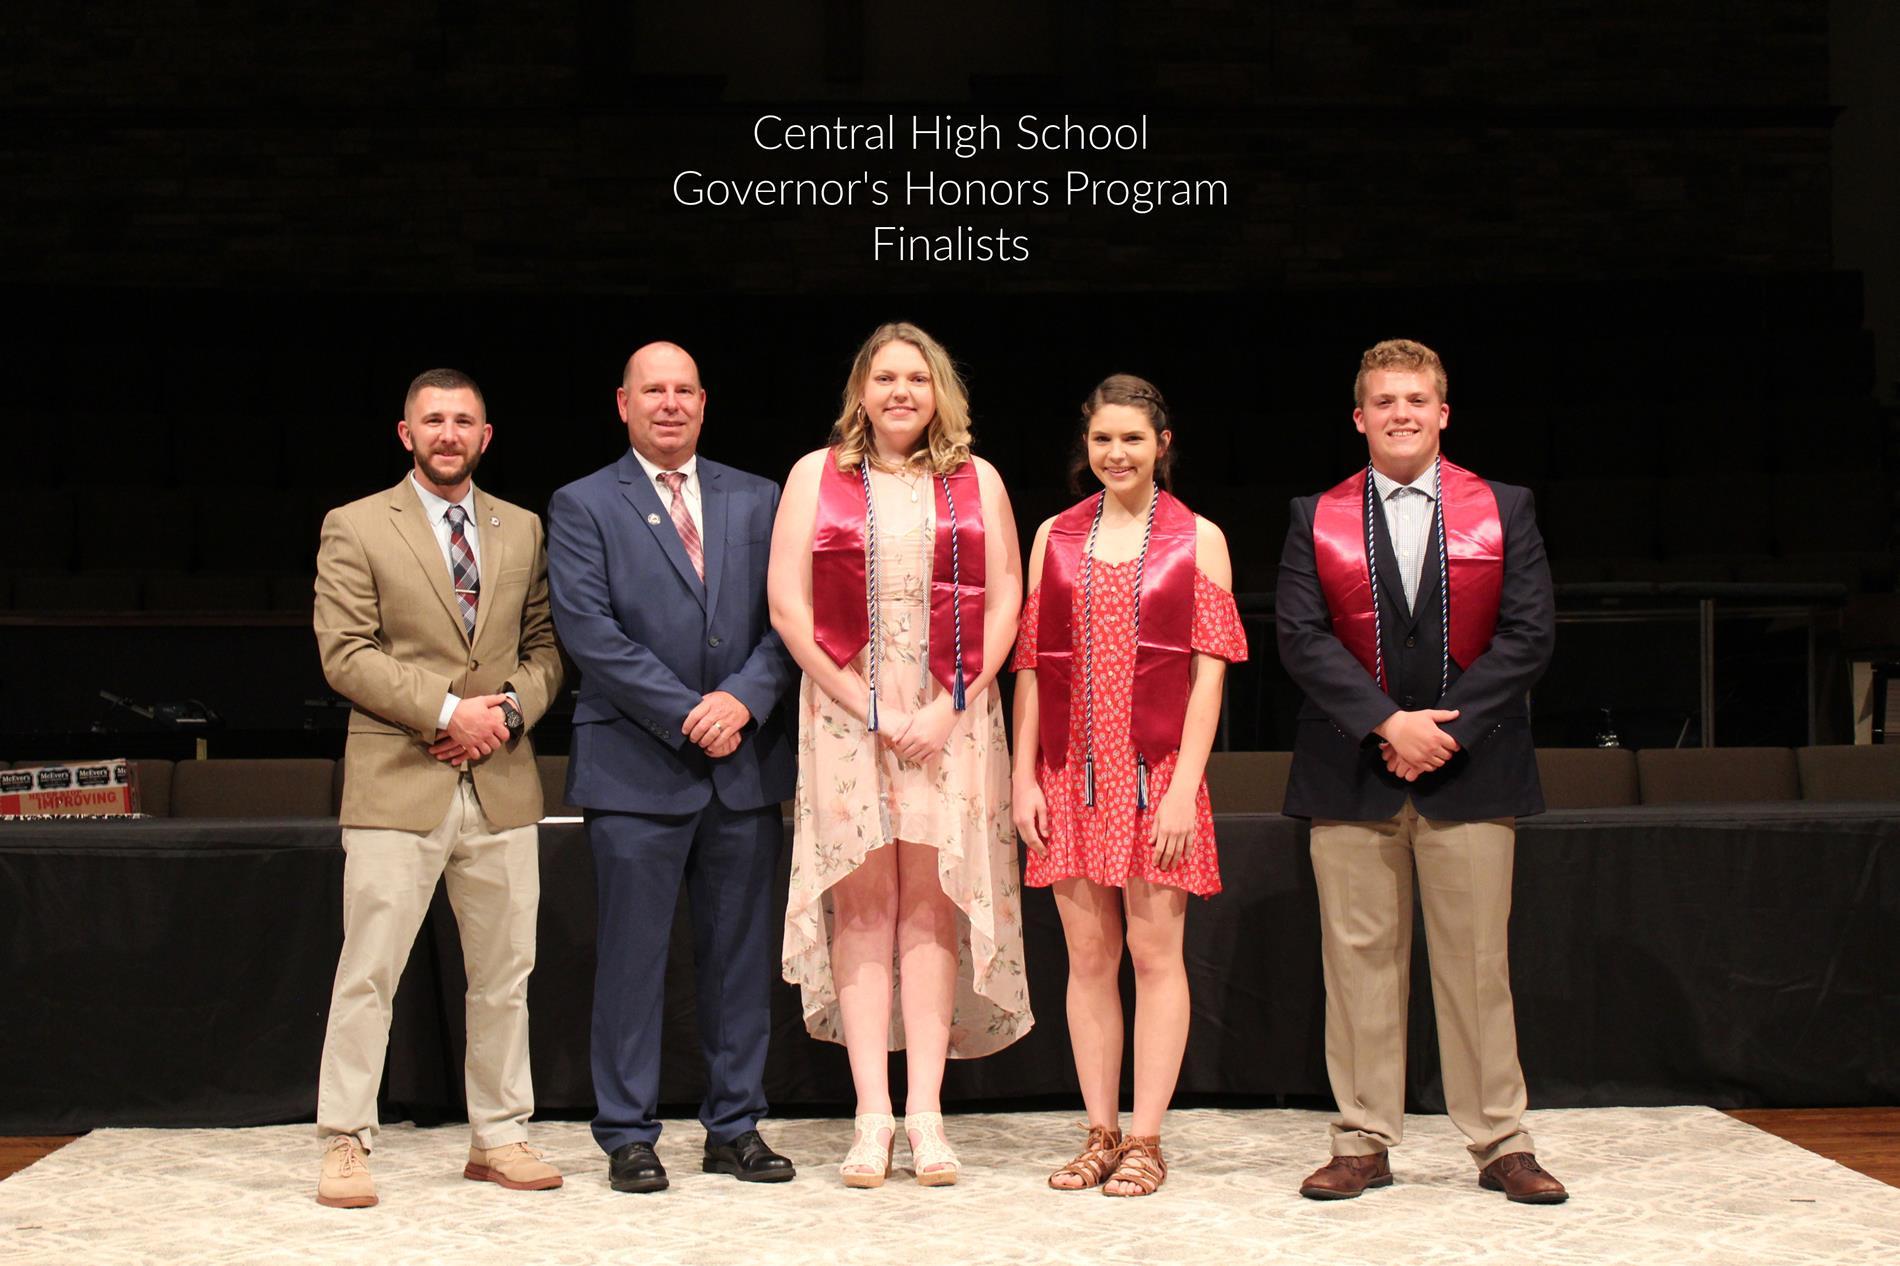 GHP Finalists